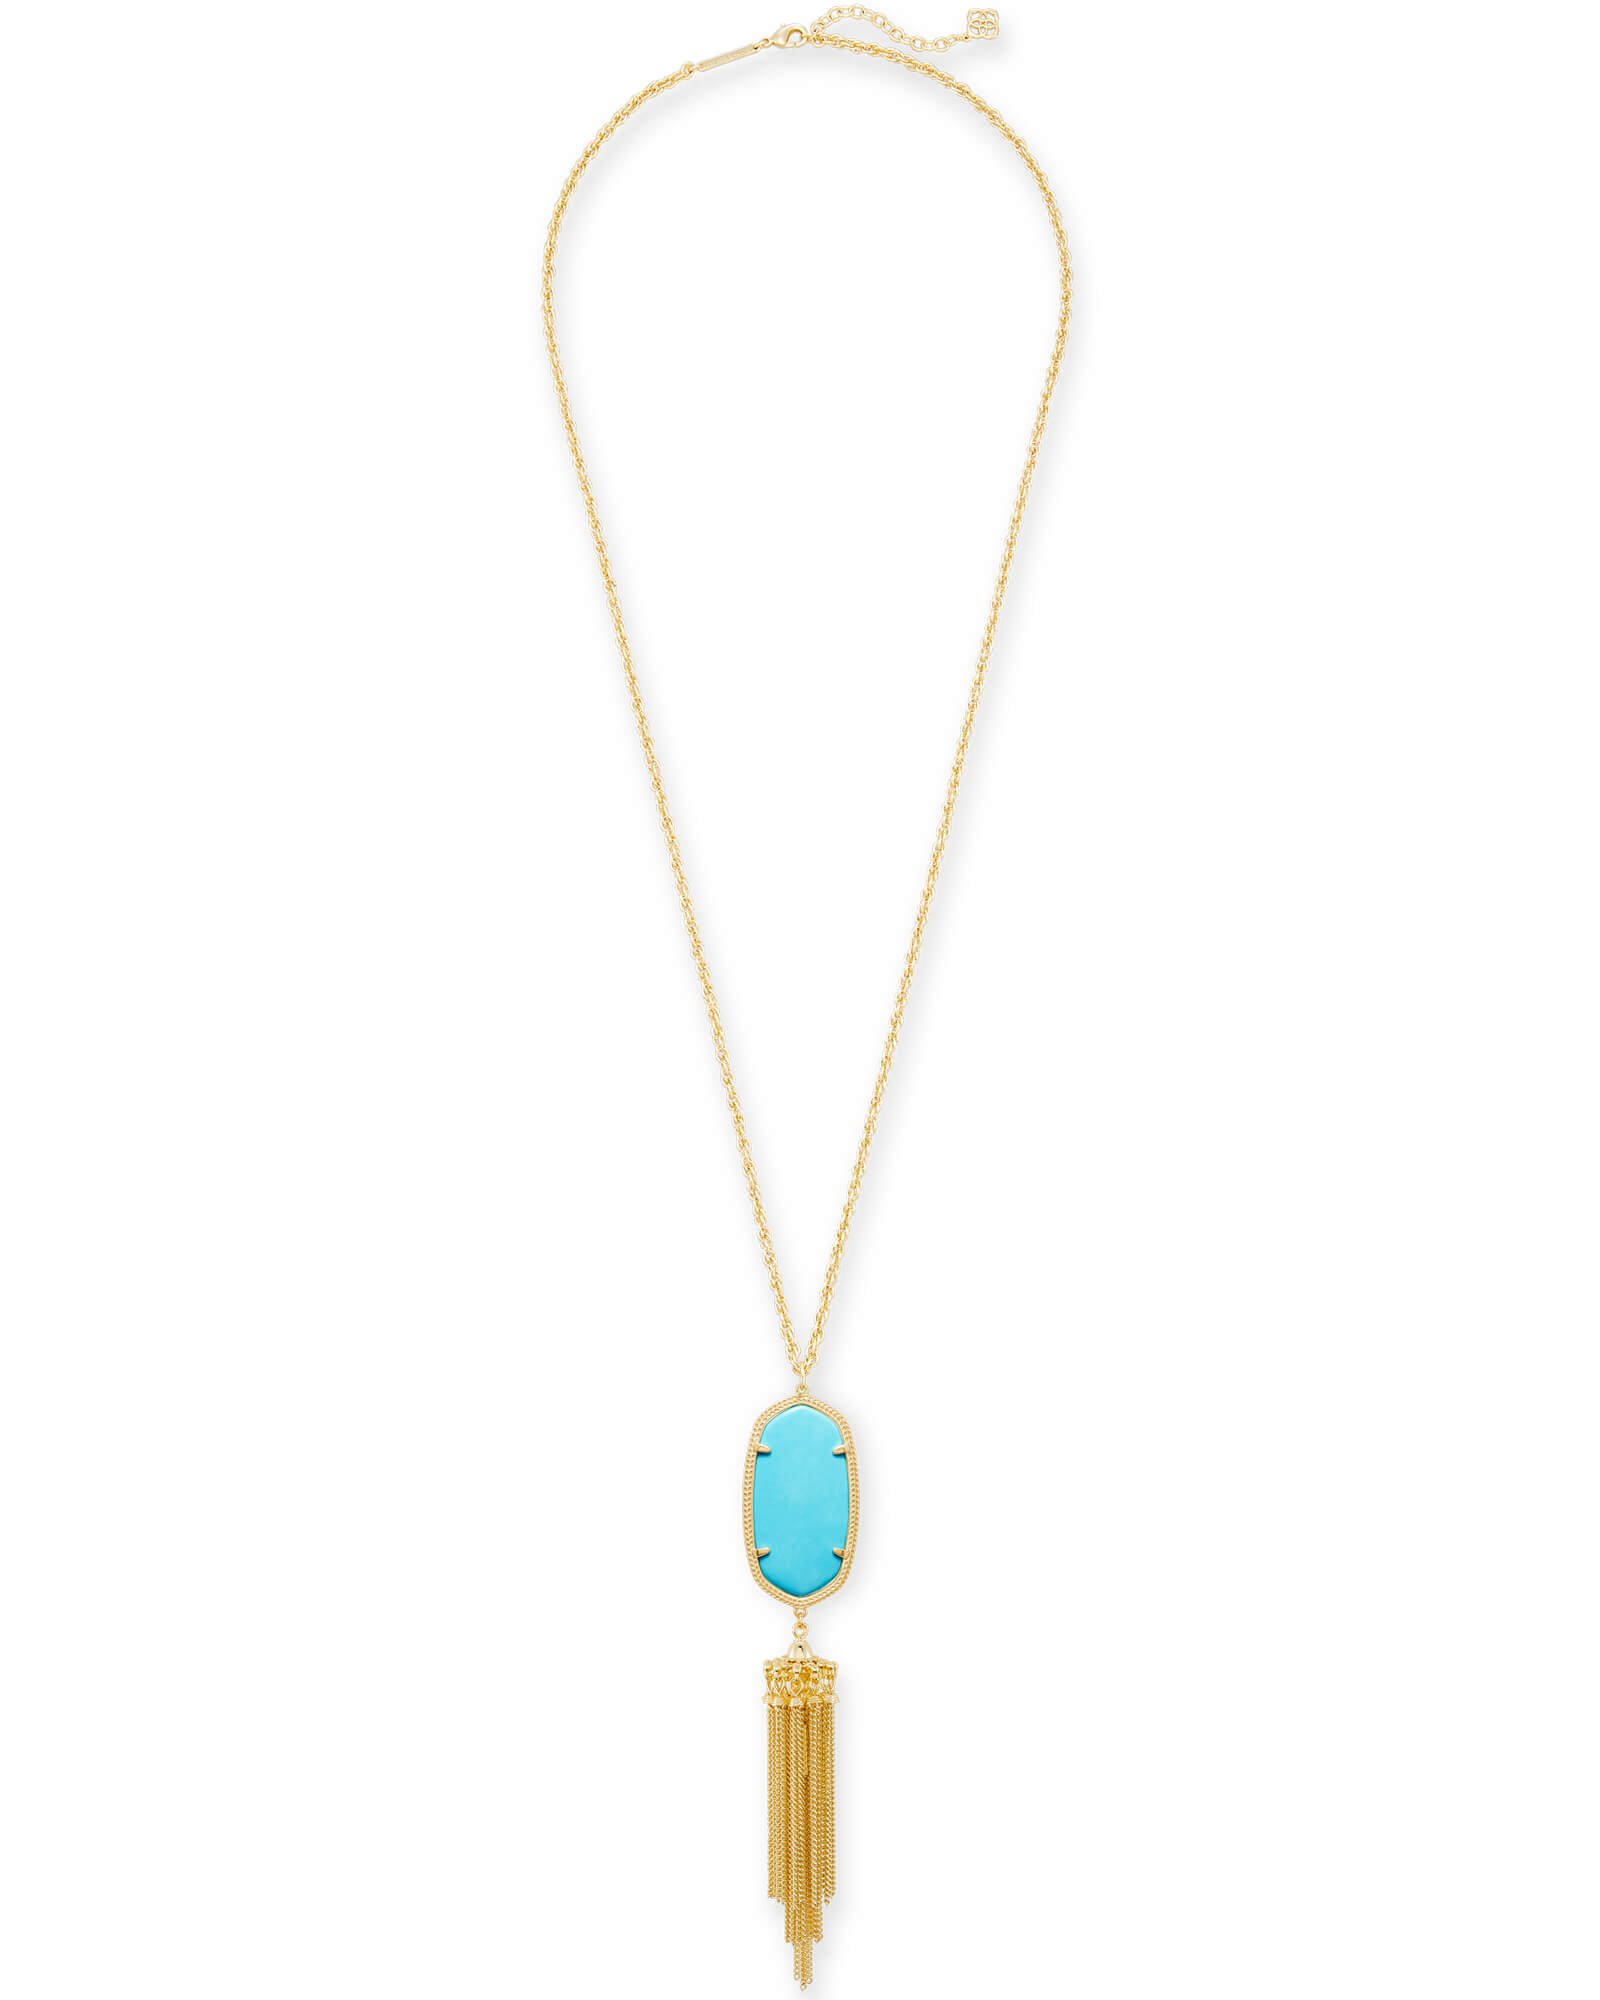 Rayne GoldLong Pendant Necklace in Turquoise | Kendra Scott